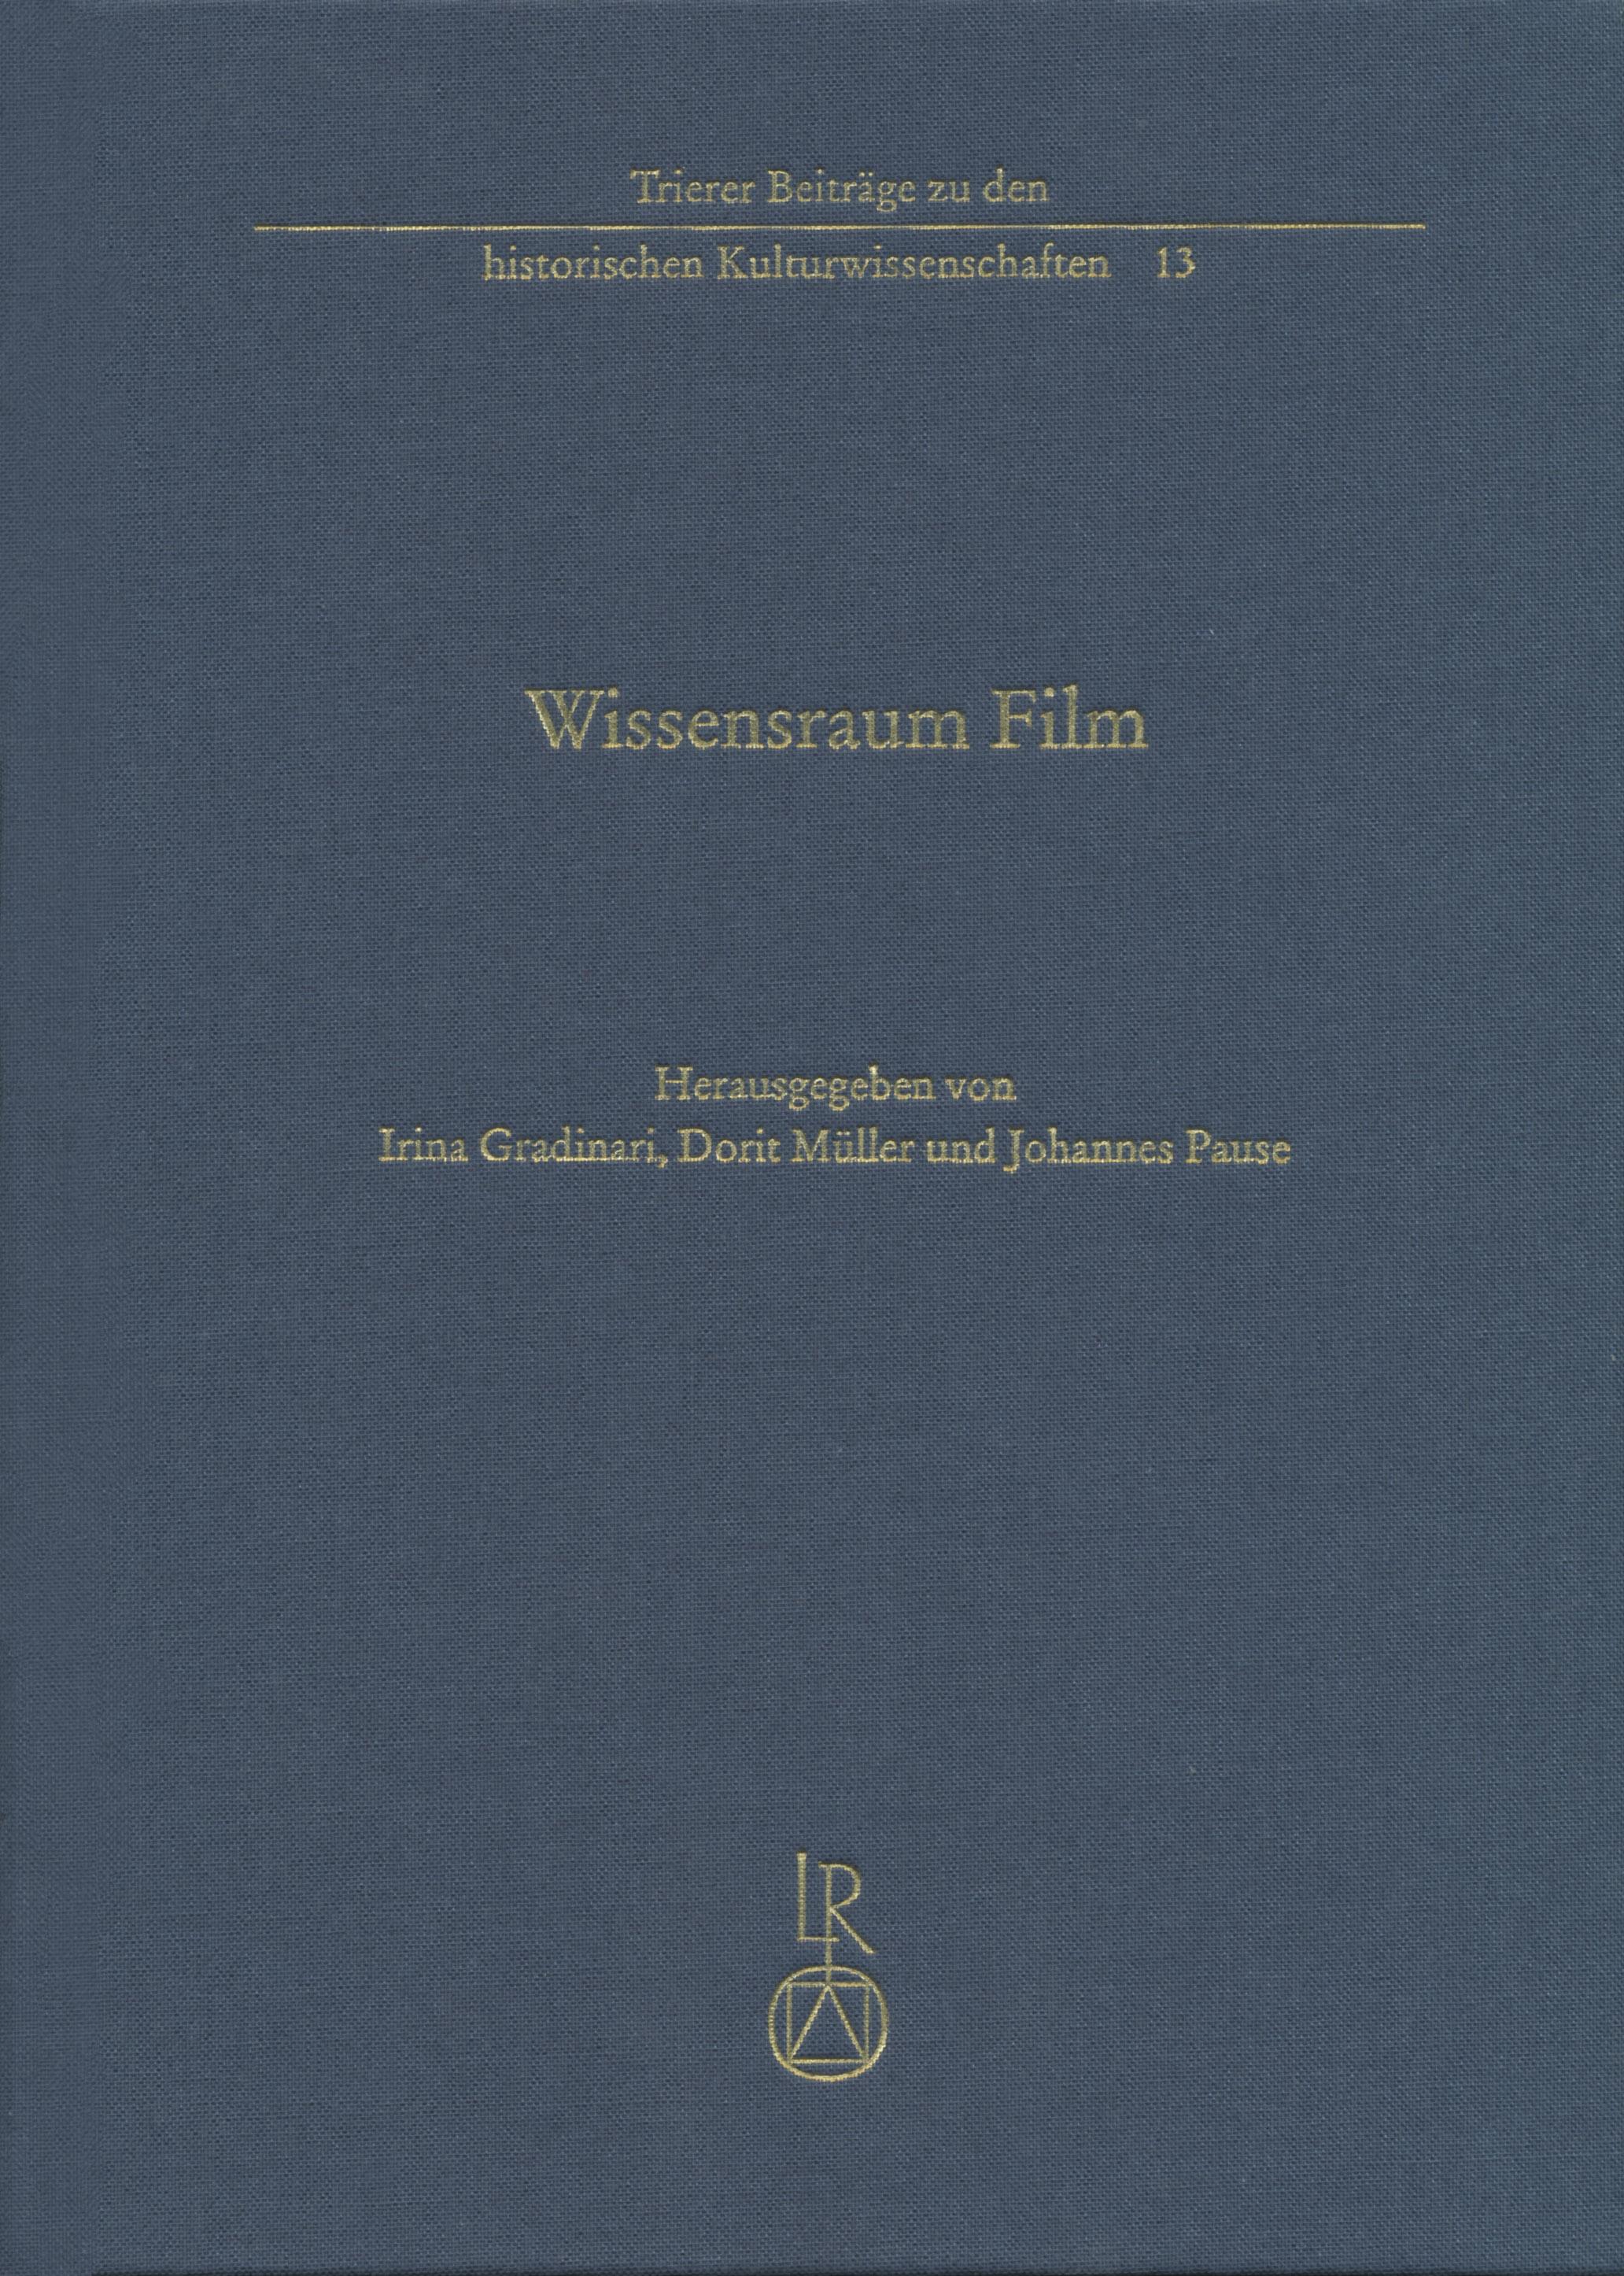 Irina Gradinari / Wissensraum Film 9783954900374